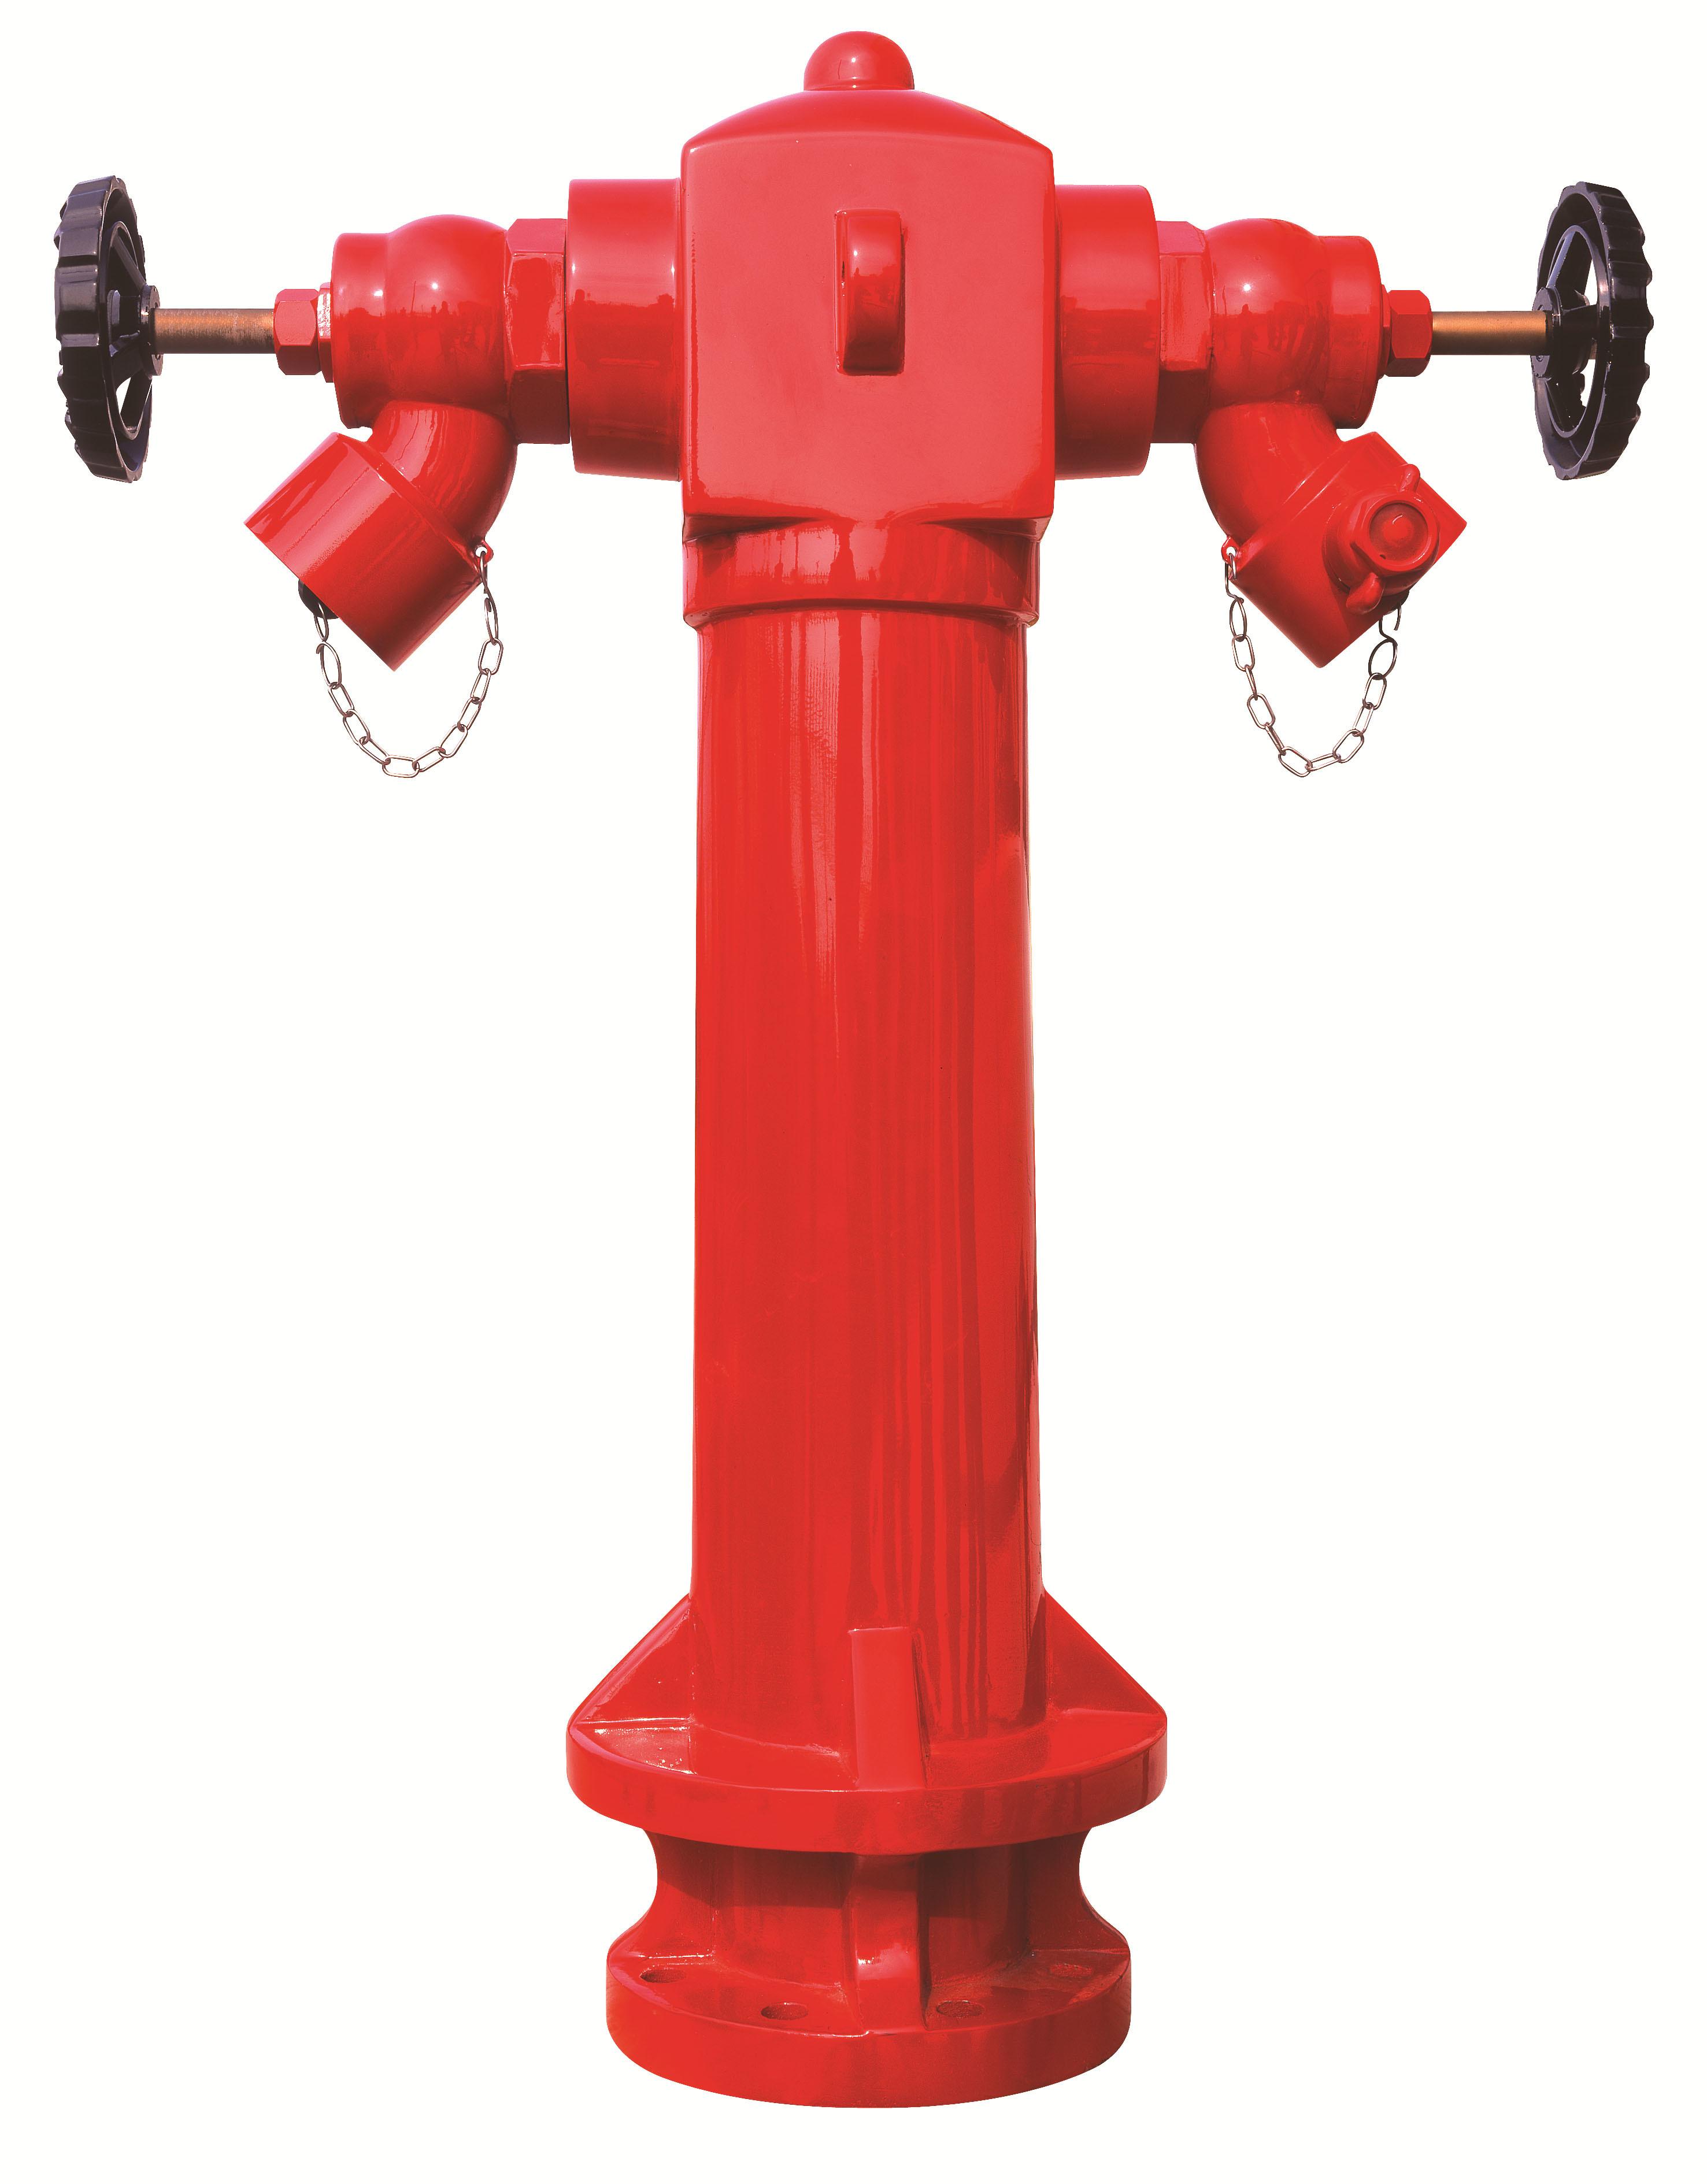 china high quality wet barrel pillar ground fire hydrant 2 ways